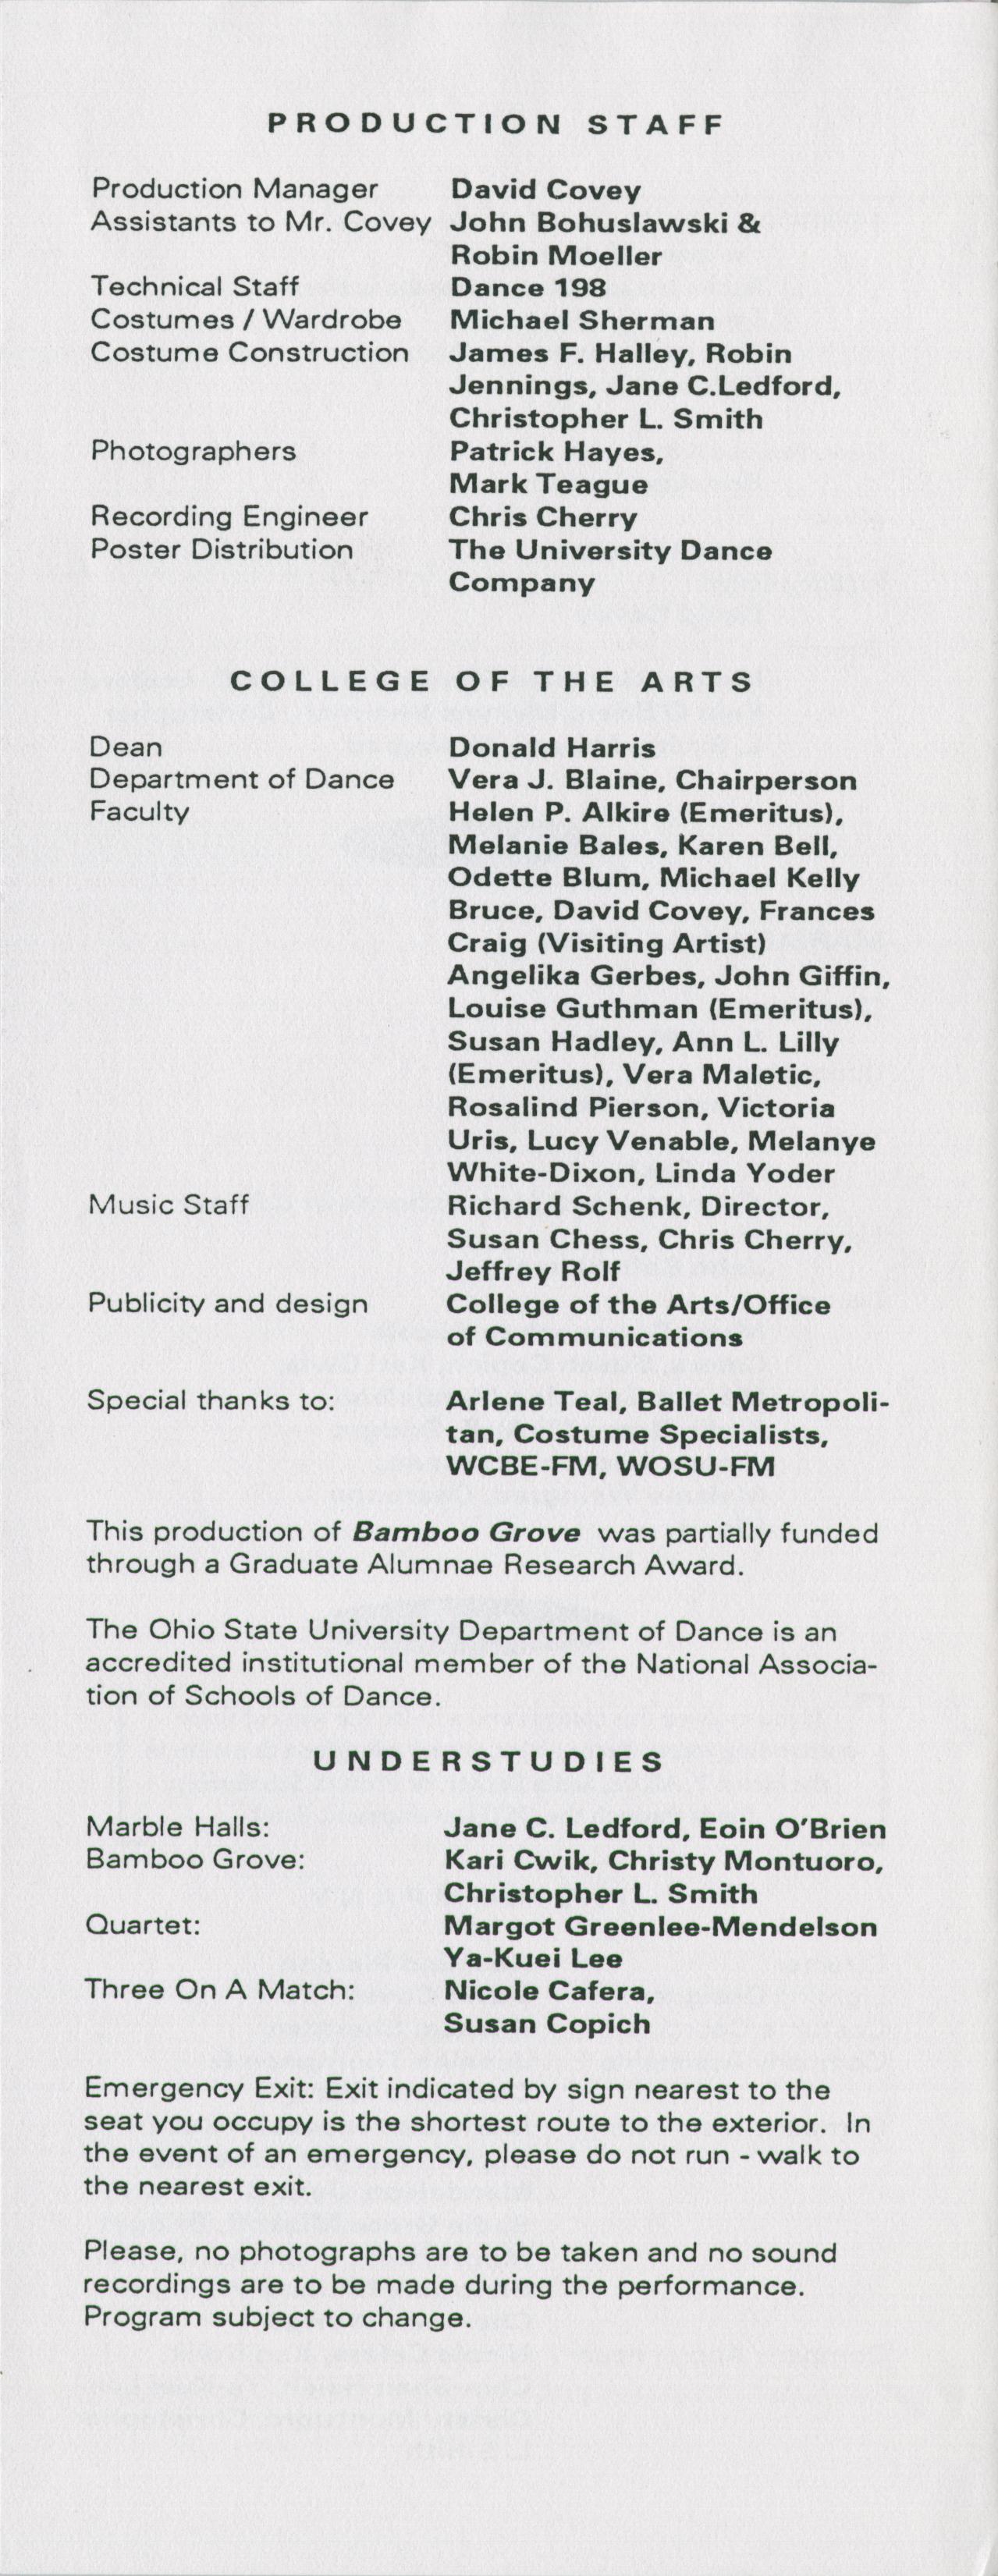 UDC_1992.1_DancePrograms-023-003.jpg